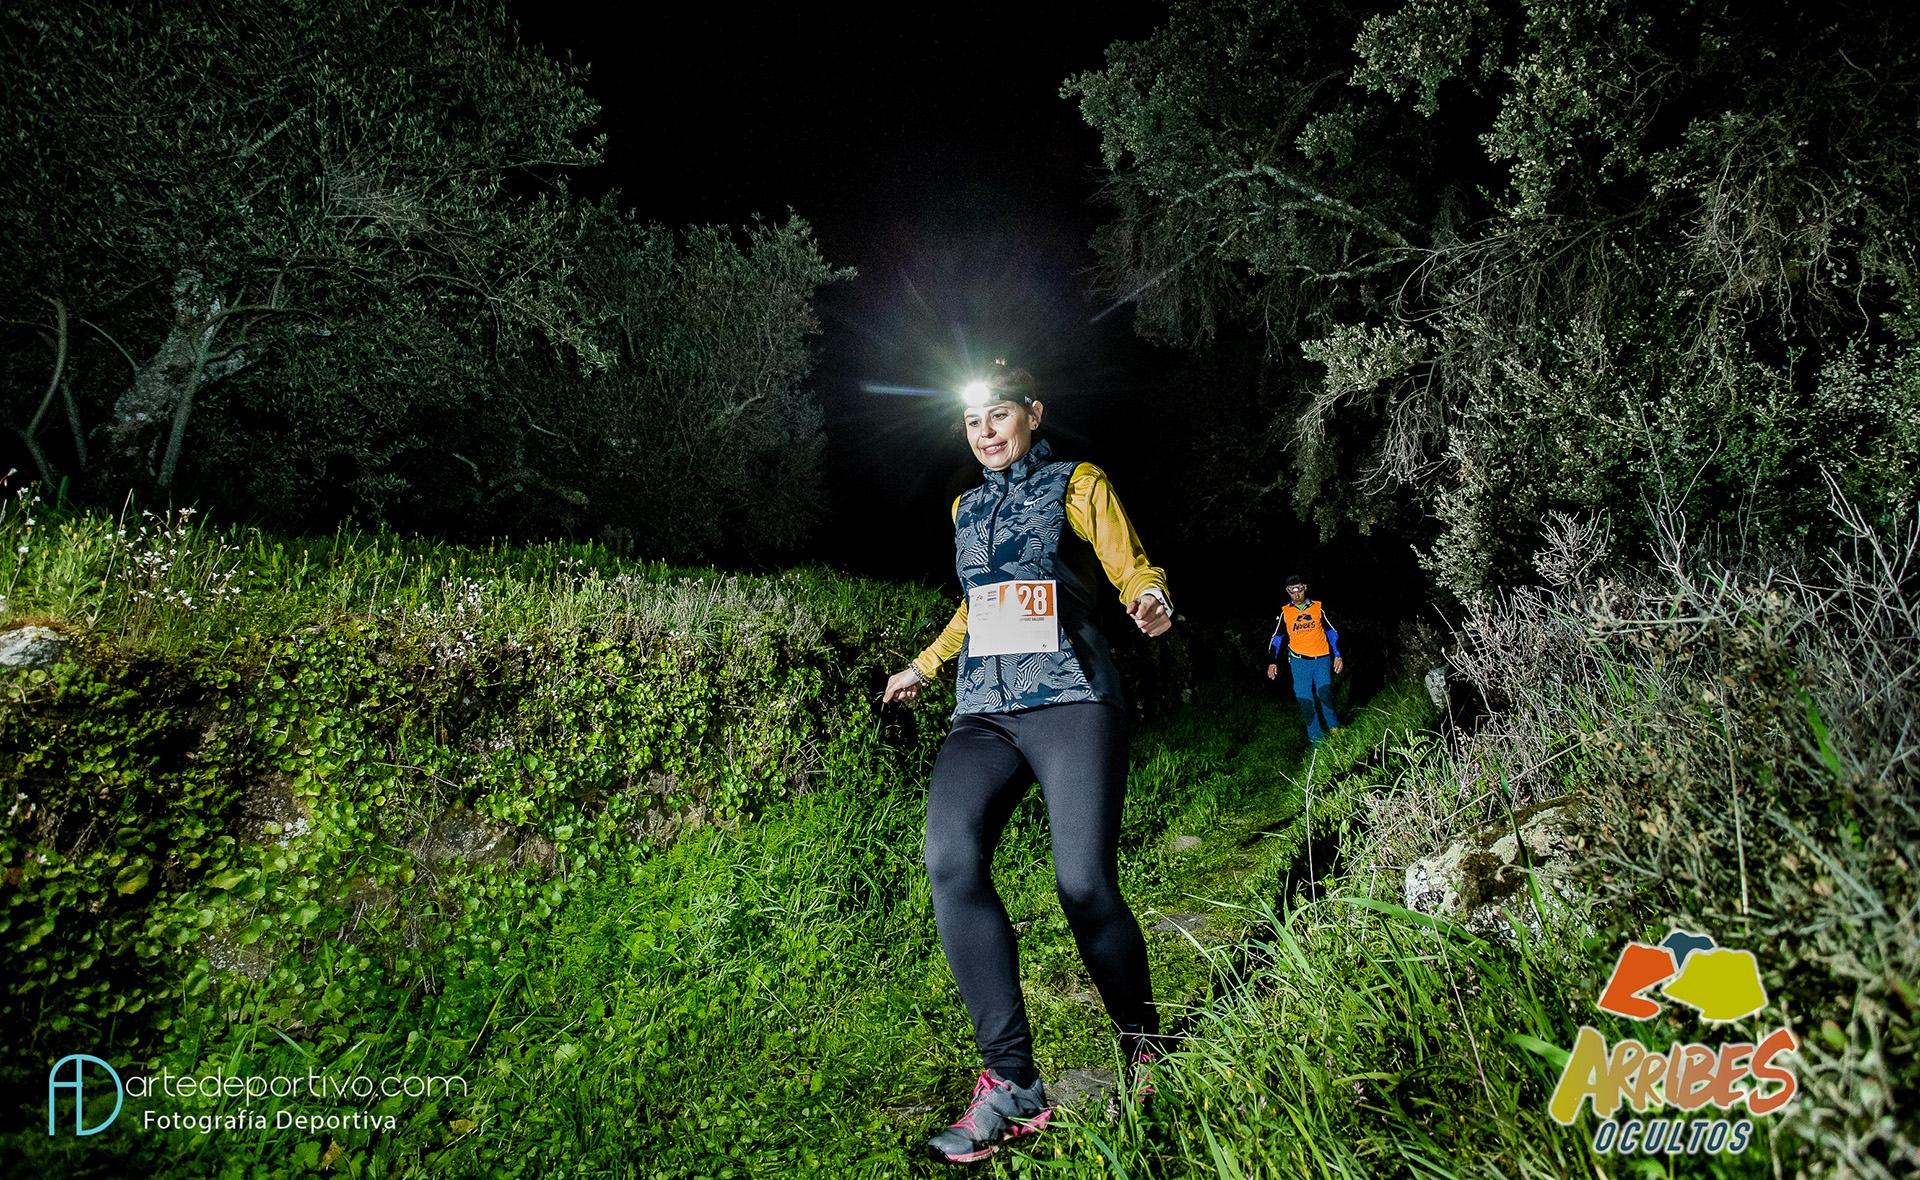 Slider 2020 - Arribes Ocultos Trail - 02